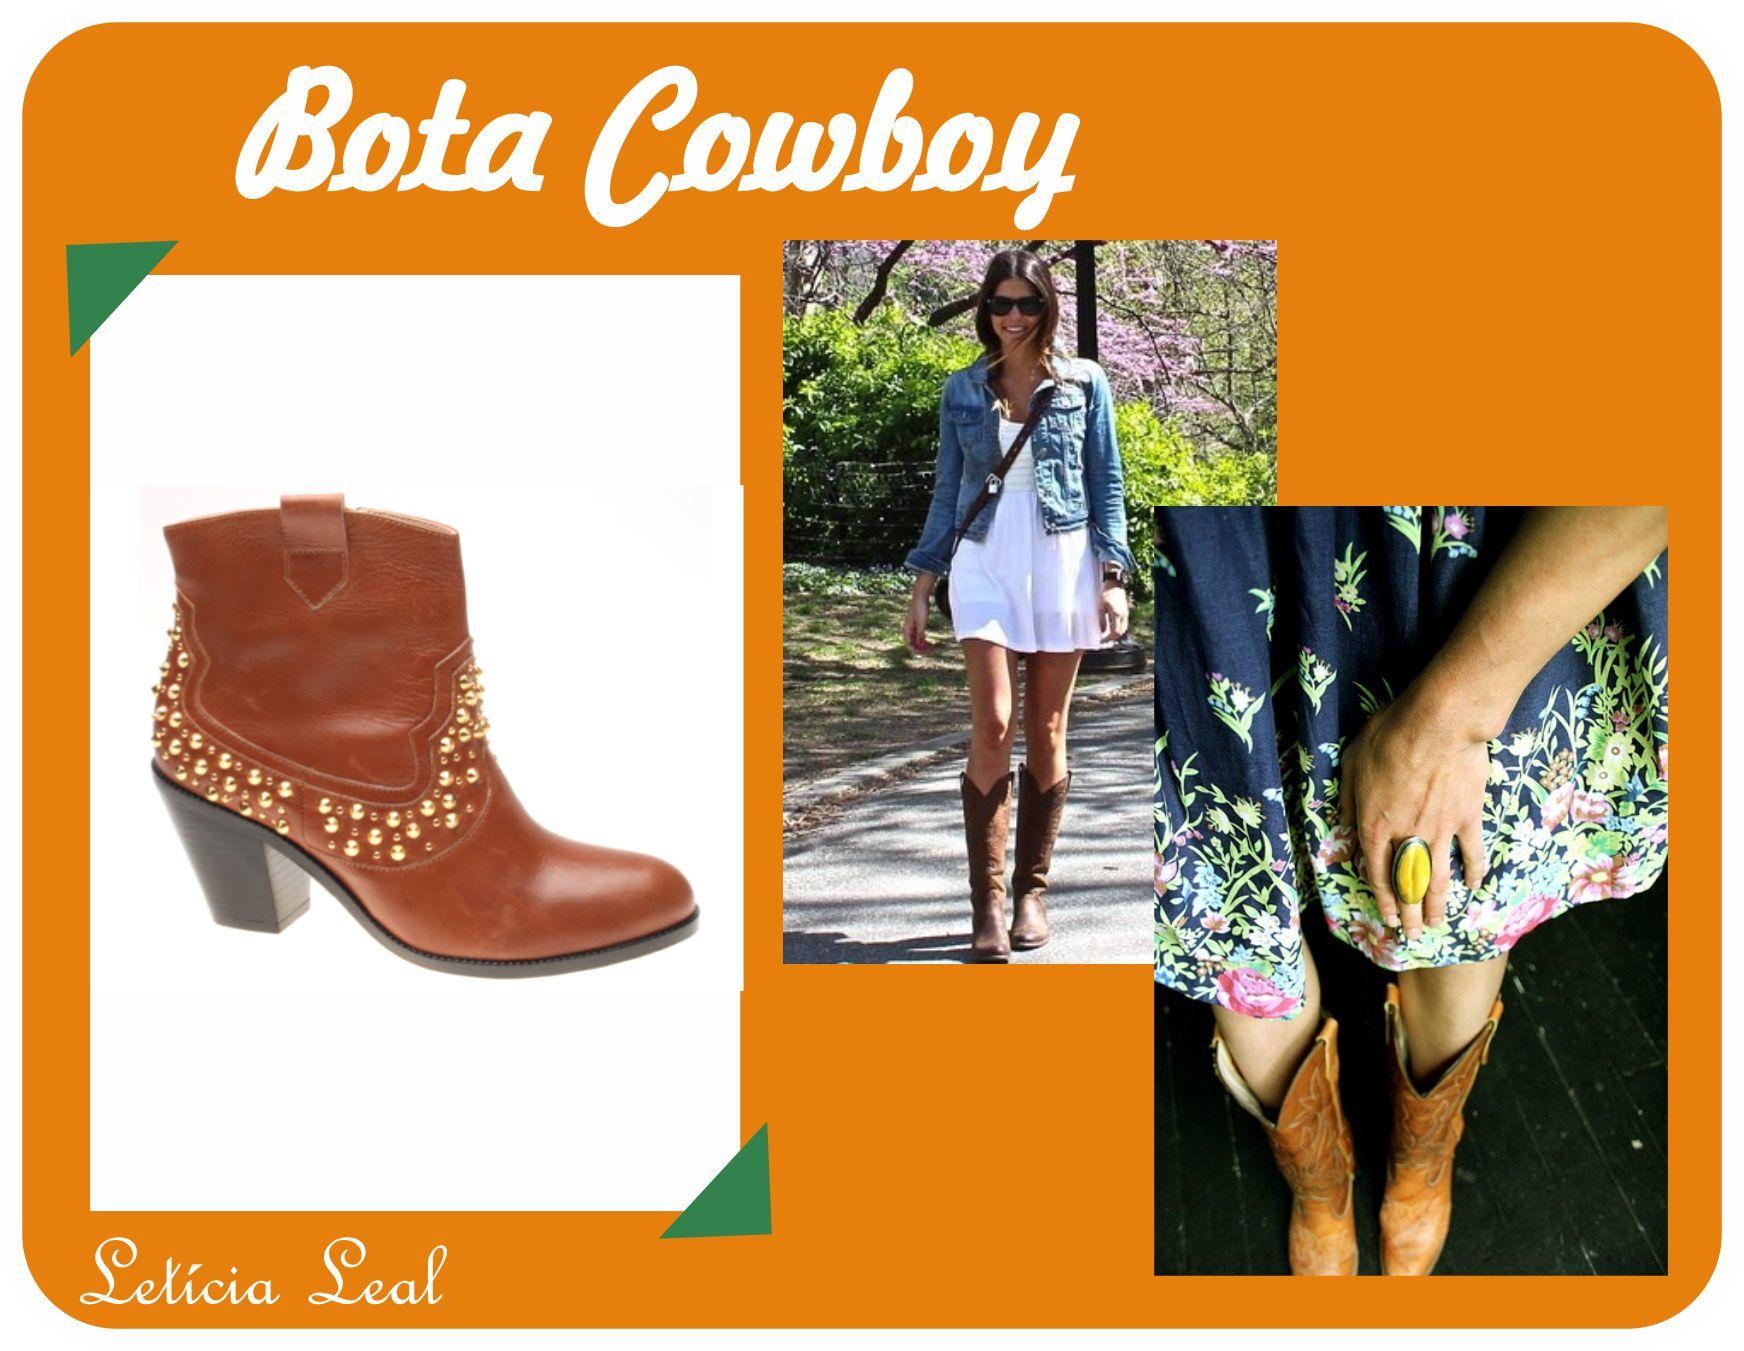 bota_cowboy_sos_solteiro